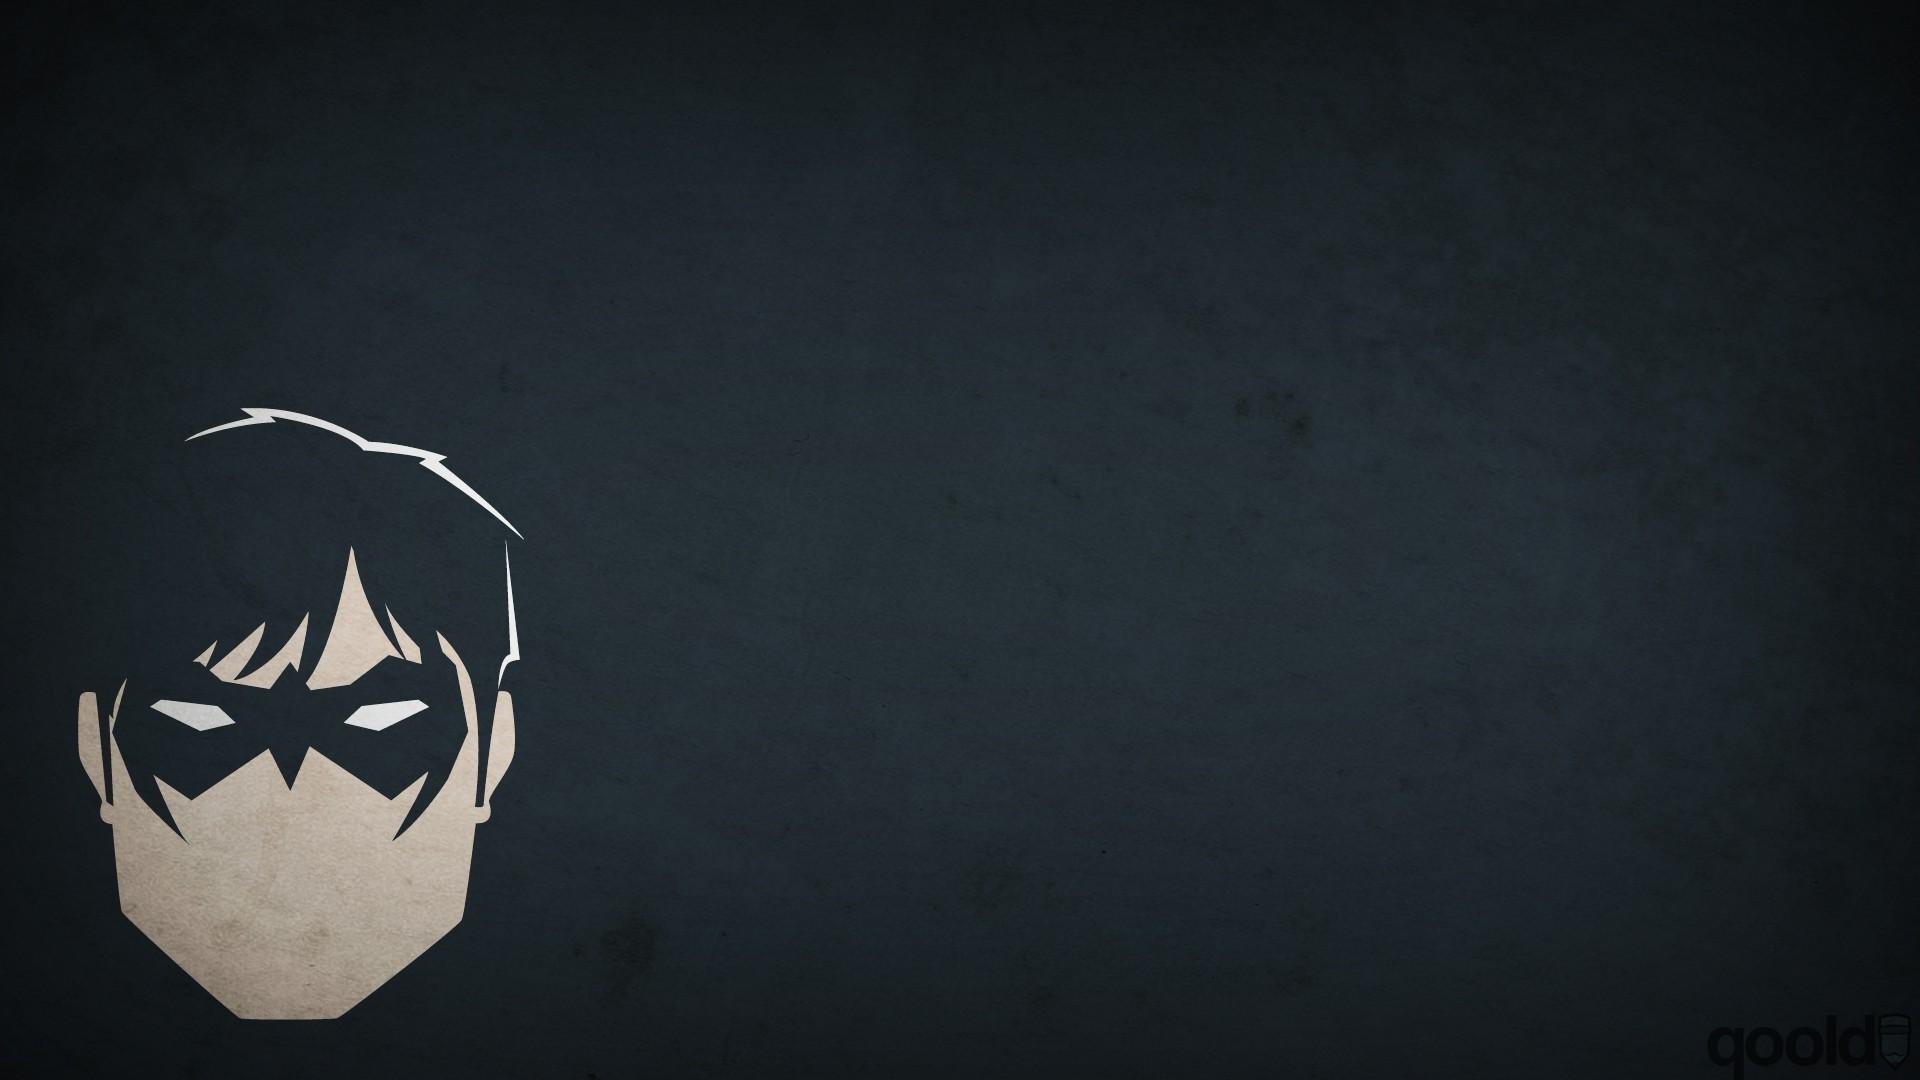 minimalism, Artwork, Blo0p, Superhero, DC Comics, Nightwing